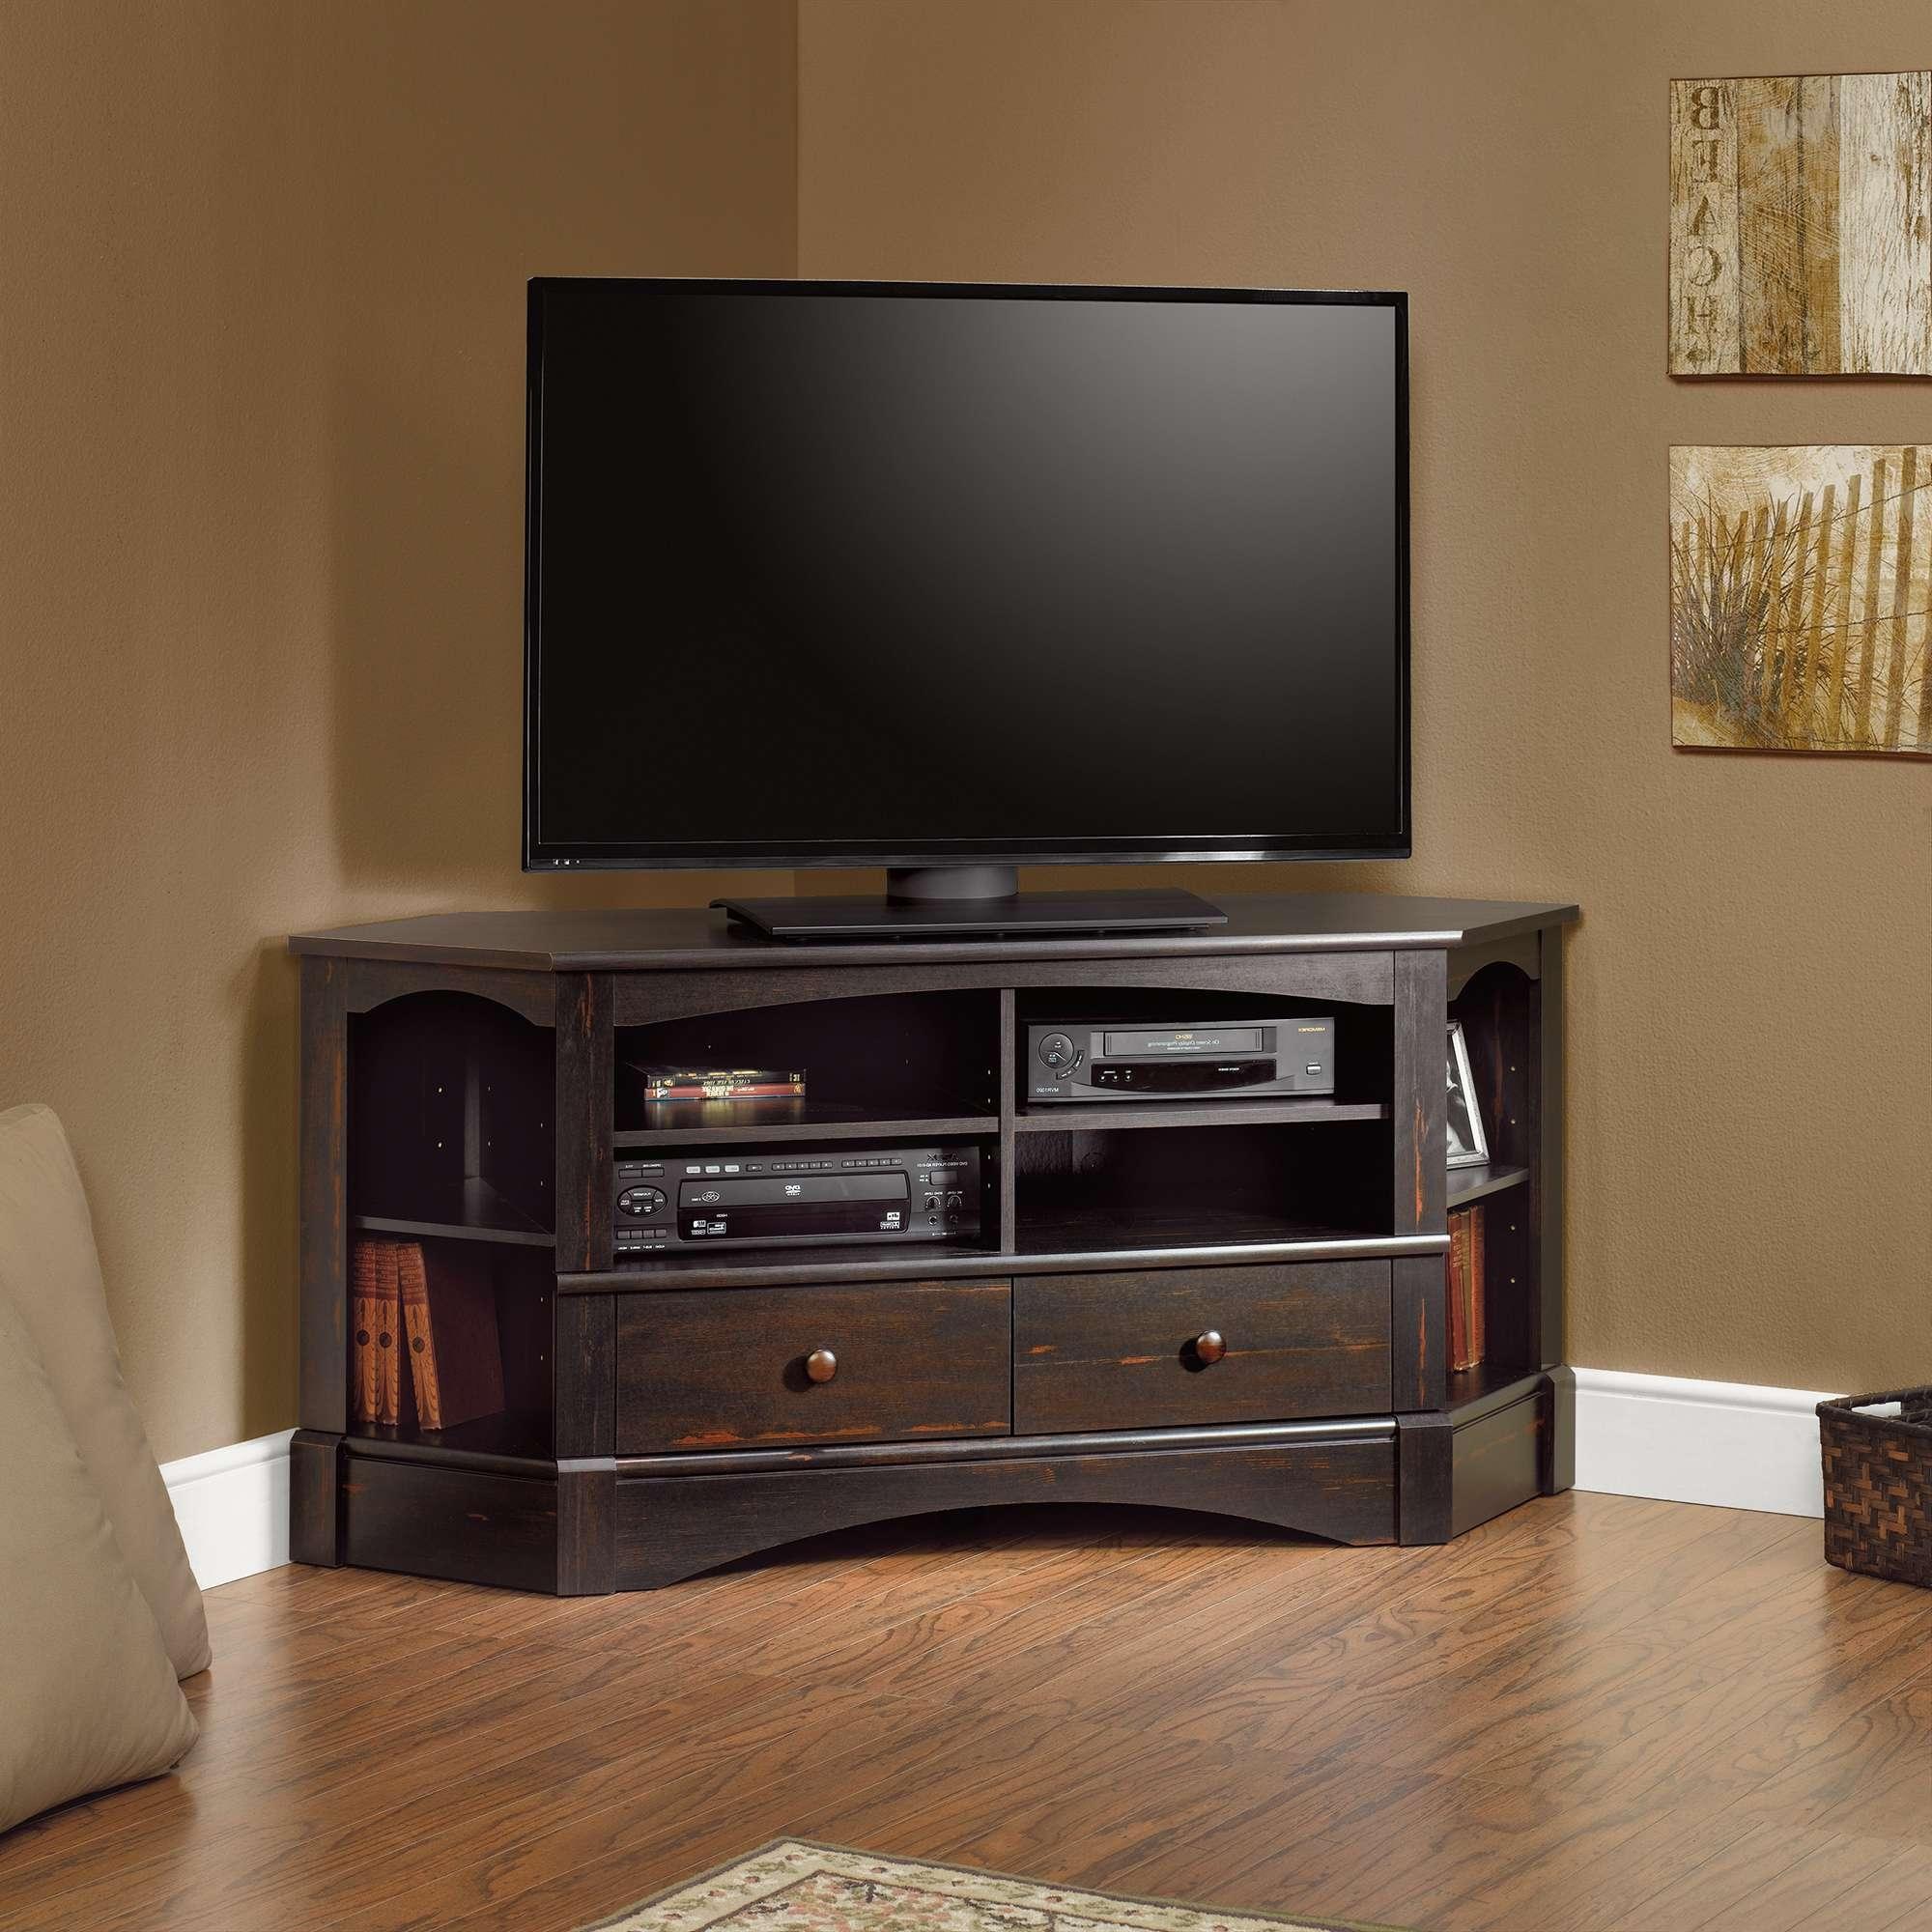 Tv : Uncommon Wood Corner Tv Stands Uk Suitable Oak Corner Tv Throughout Corner Tv Cabinets For Flat Screens With Doors (View 15 of 20)